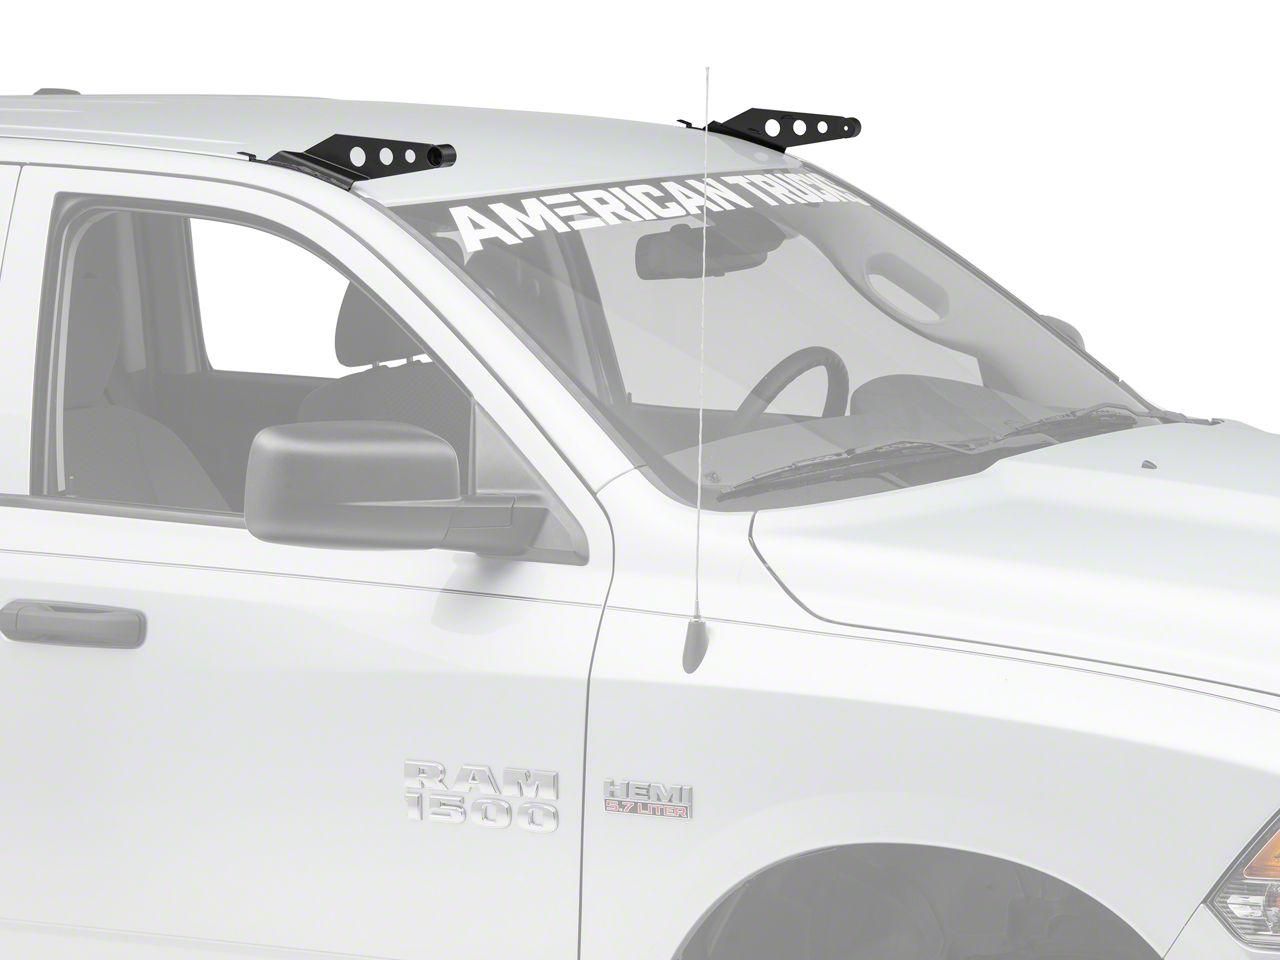 Raxiom 50 in. Curved LED Light Bar Windshield Mounting Brackets (09-15 RAM 1500)